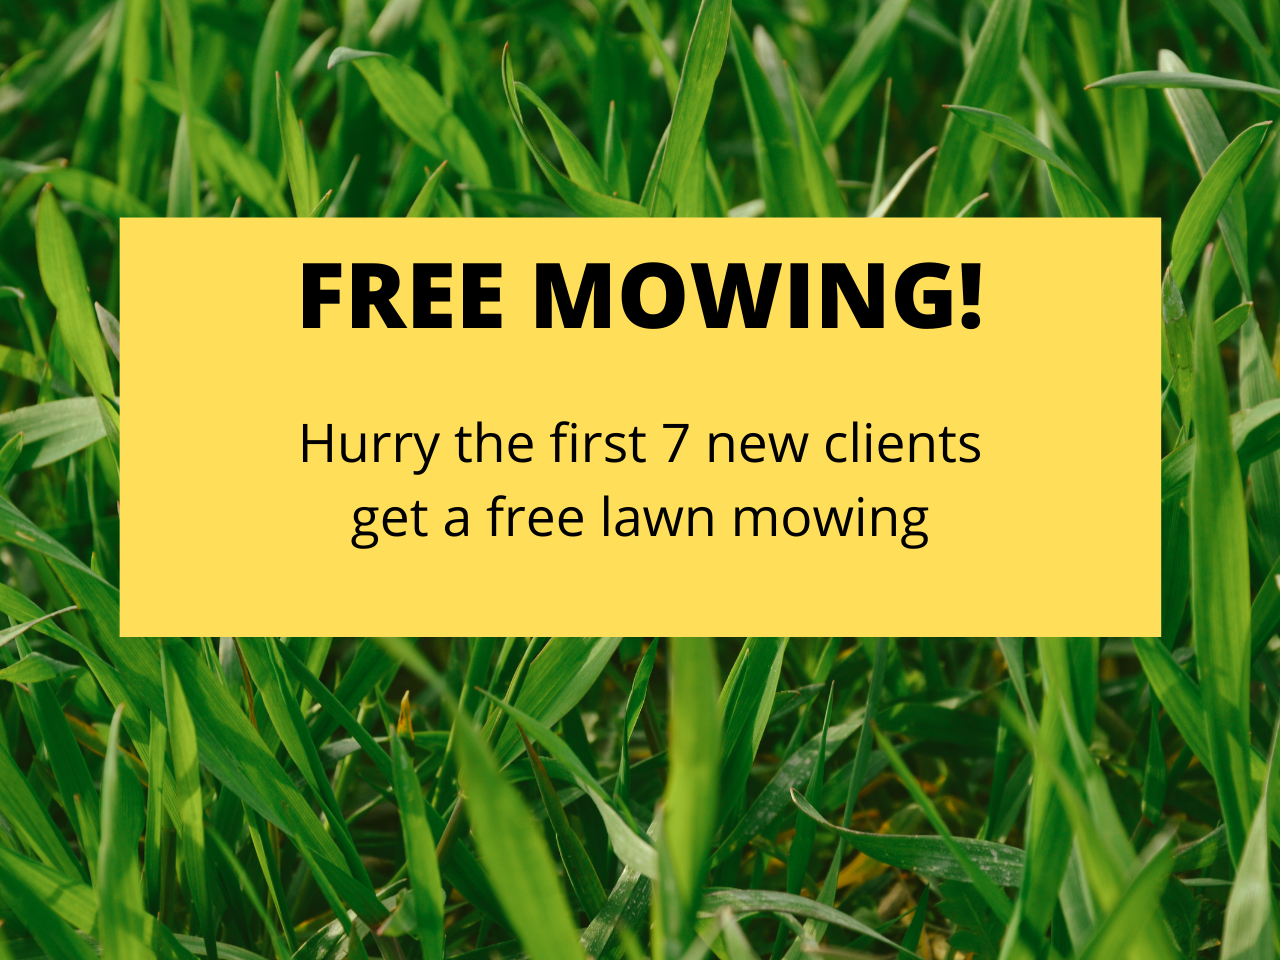 FREE MOWING Syracuse Area